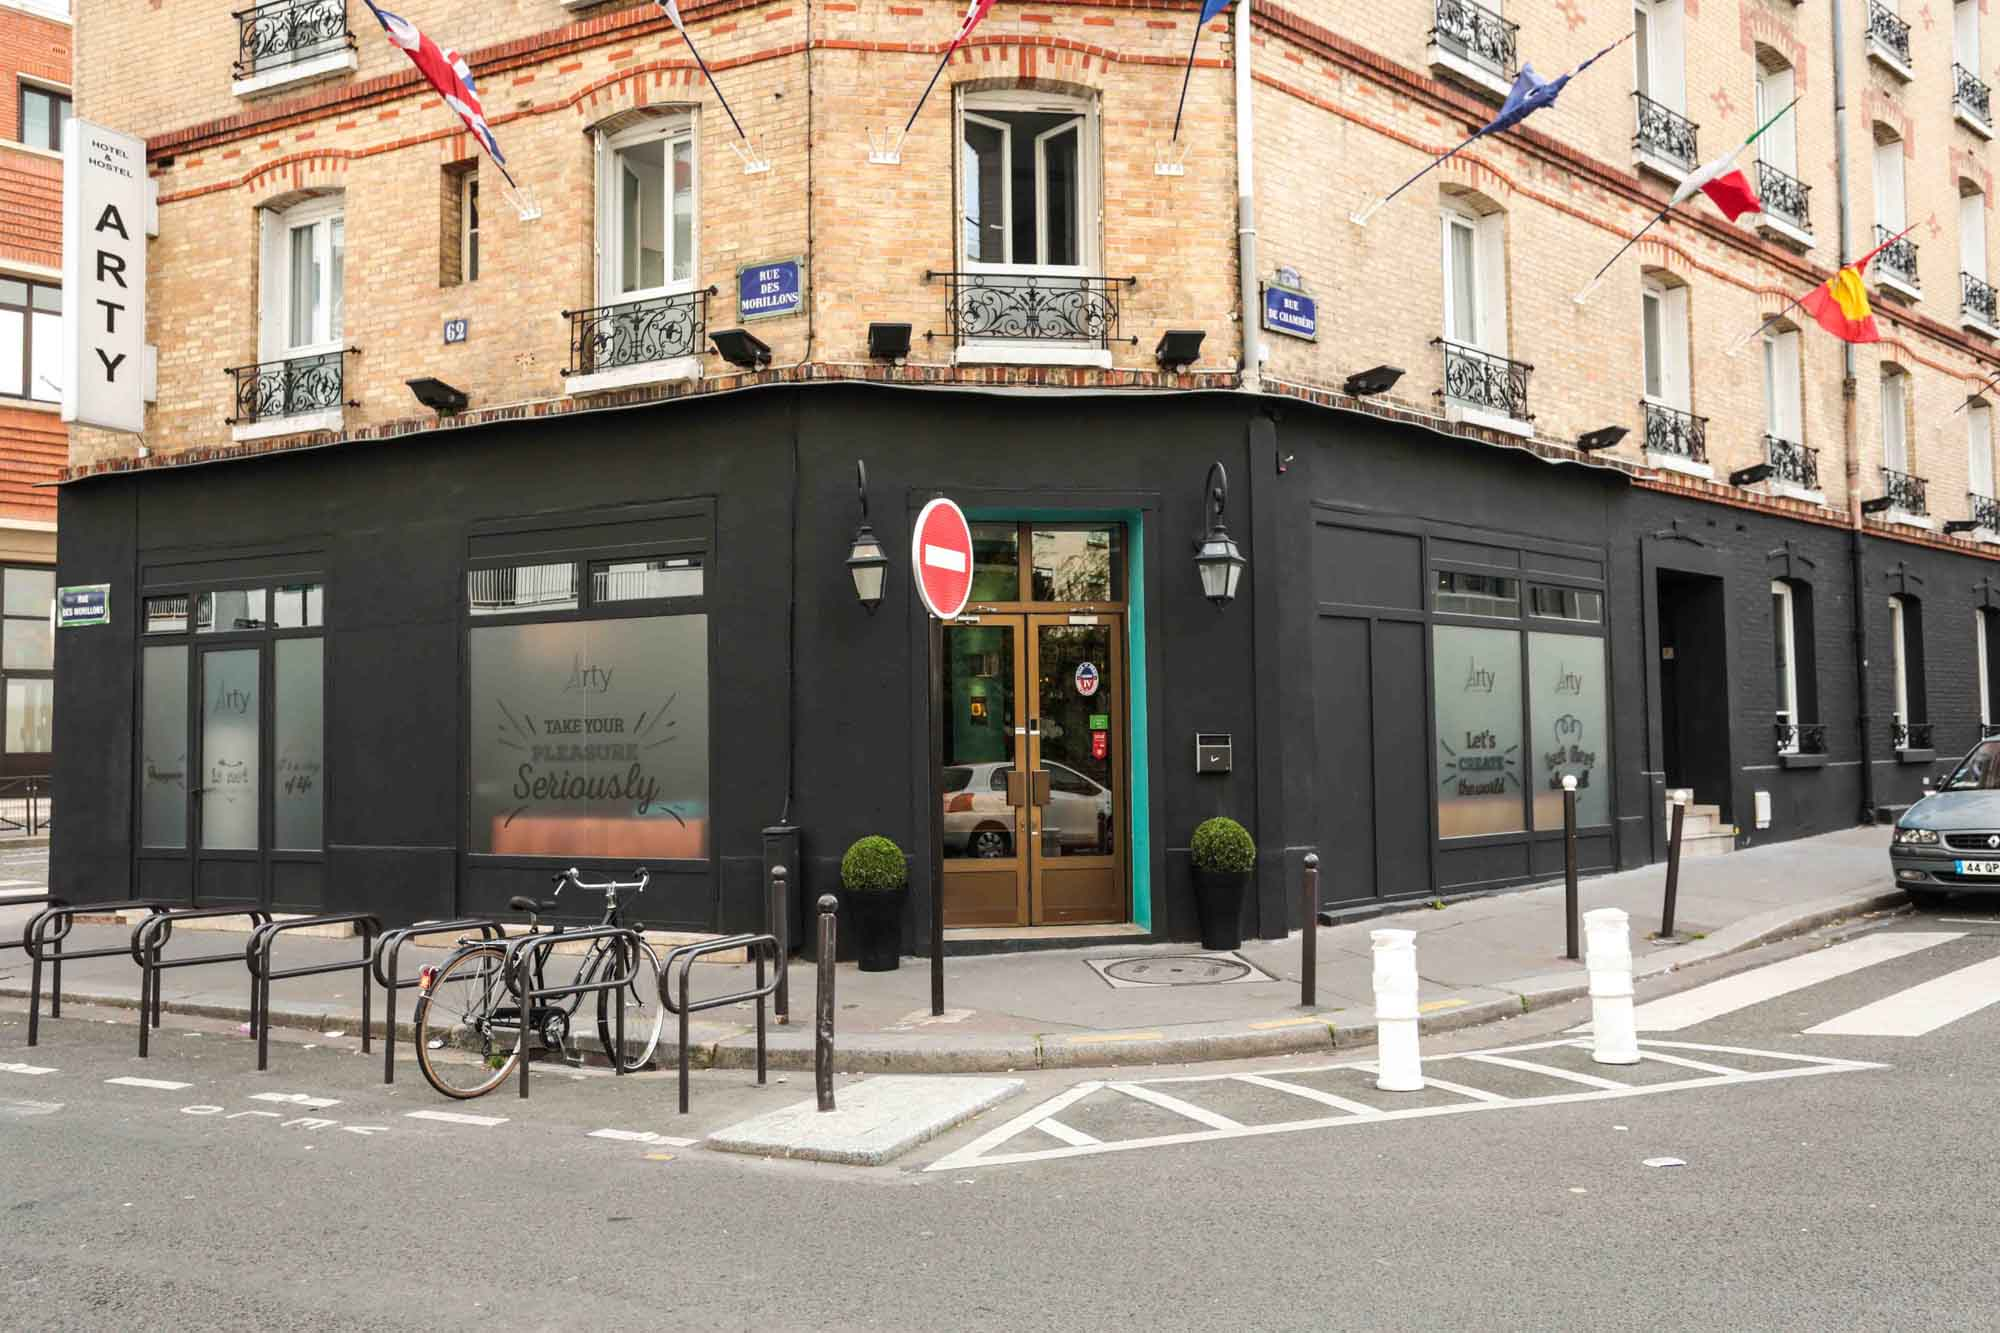 Arty Paris Porte de Versailles by River Hotels  galeria